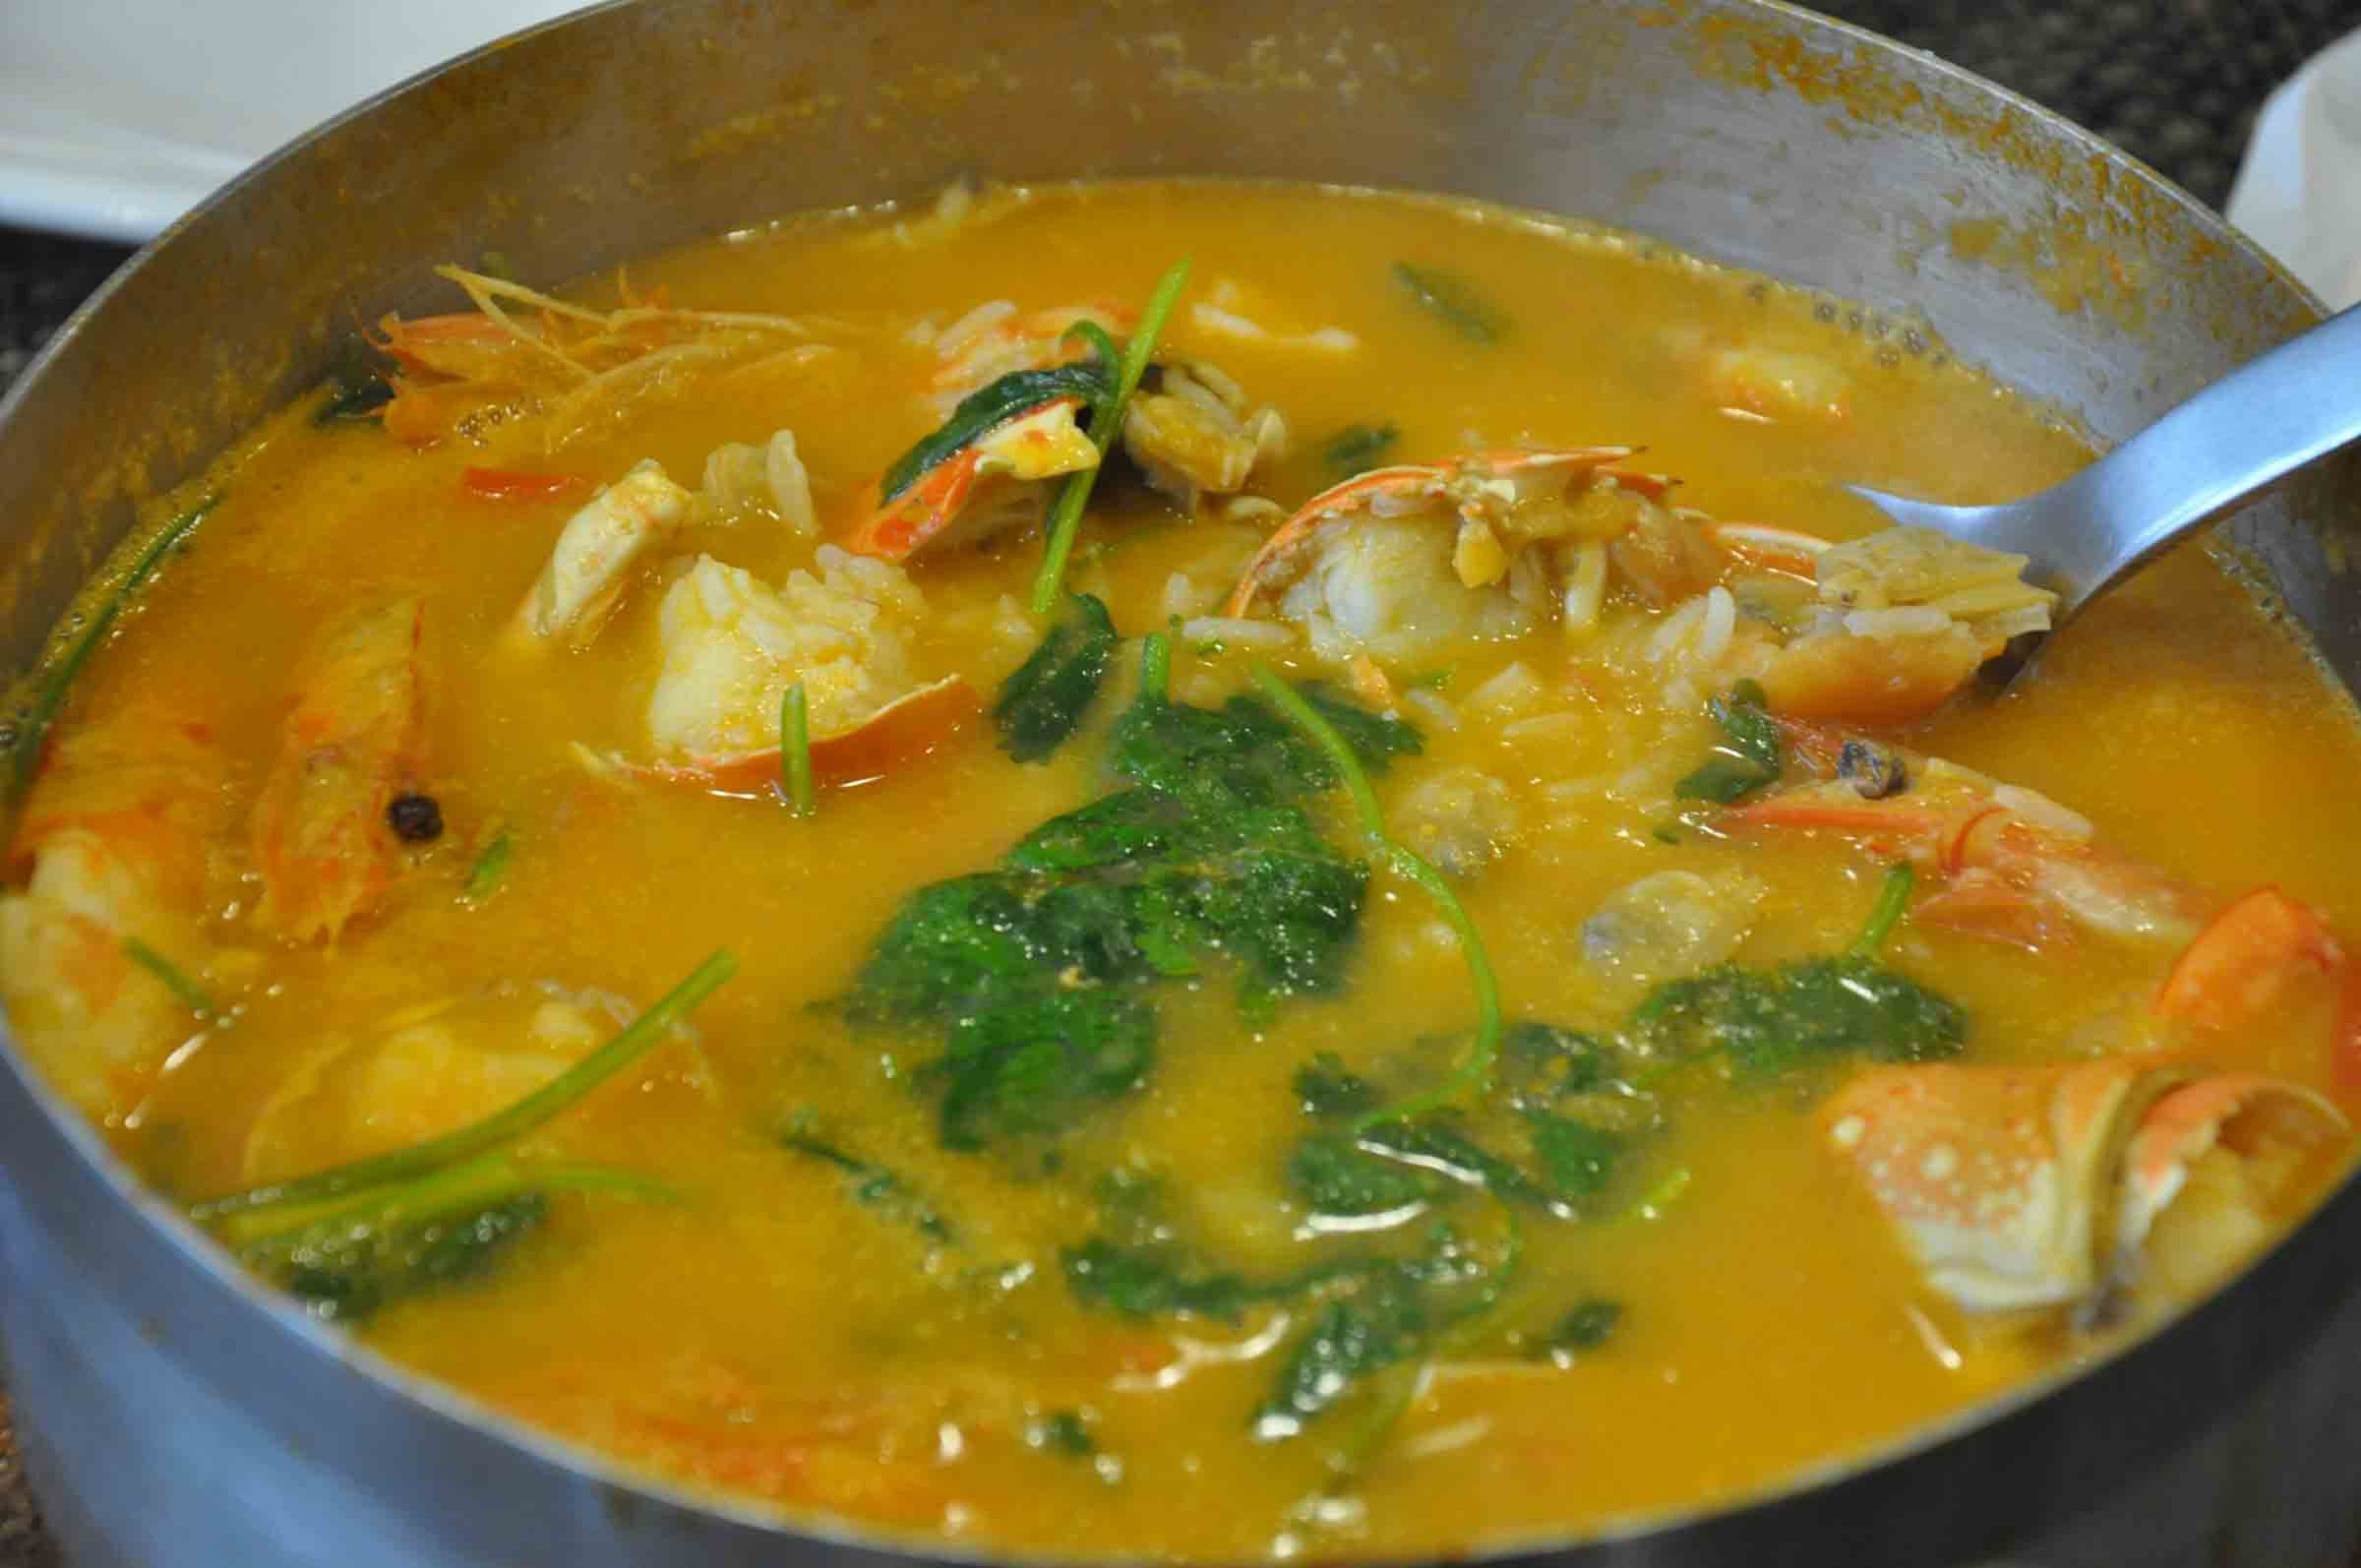 Best Macau Dishes: Seafood Rice at A Baia